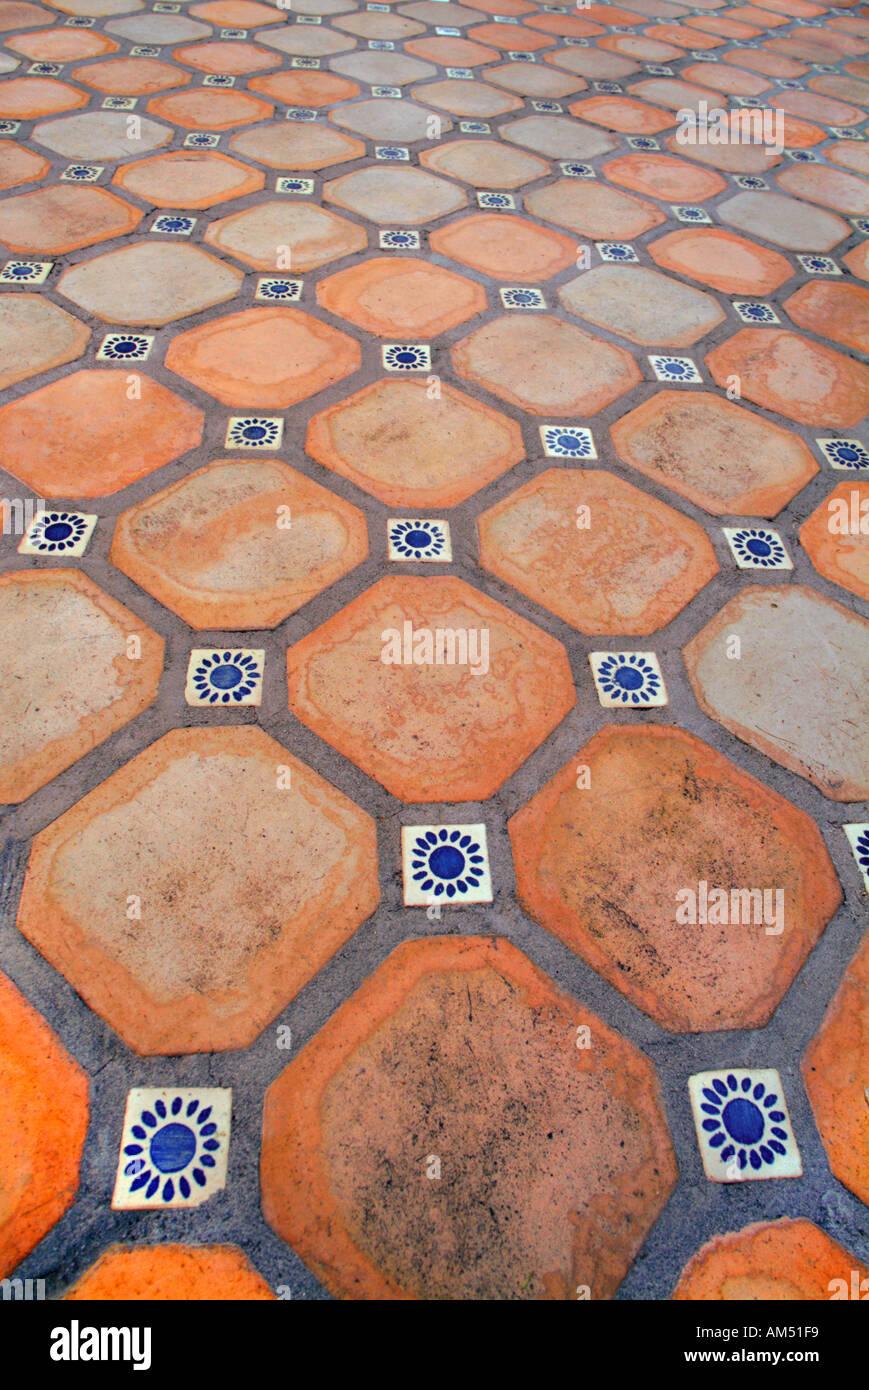 Ceramic terra cotta spanish tile floor stock photo royalty free ceramic terra cotta spanish tile floor dailygadgetfo Choice Image